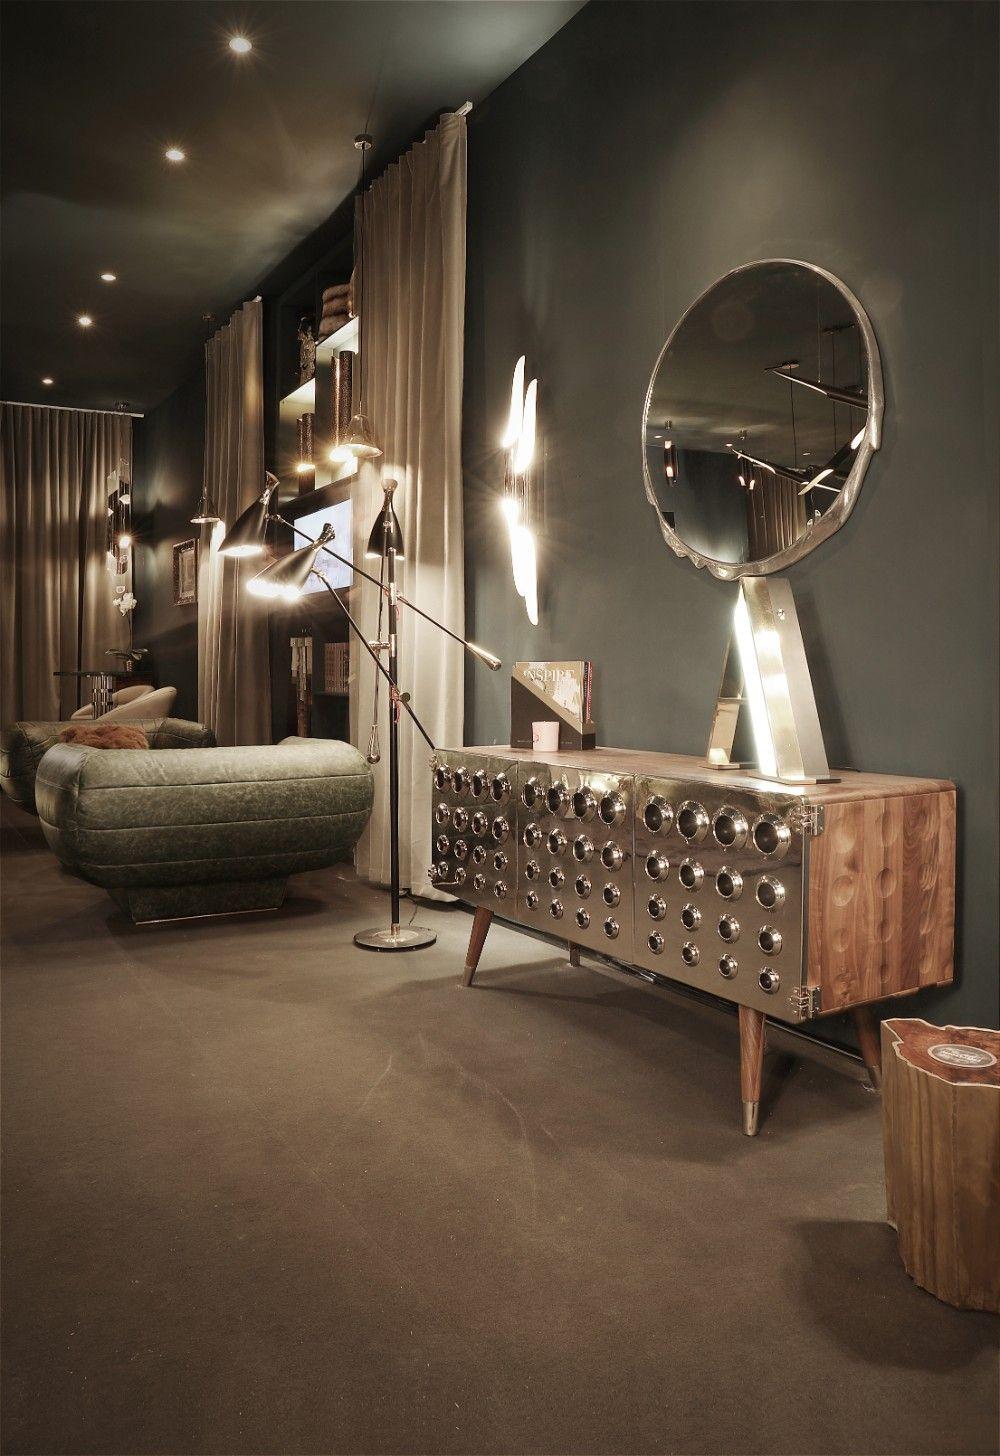 @covethouse_ at @isaloni | Salone del Mobile 2017 | iSaloni 2017 #salonedelmobile #isaloni #interiordesign Find more at: http://www.covethouse.eu/ISALONI-2017/